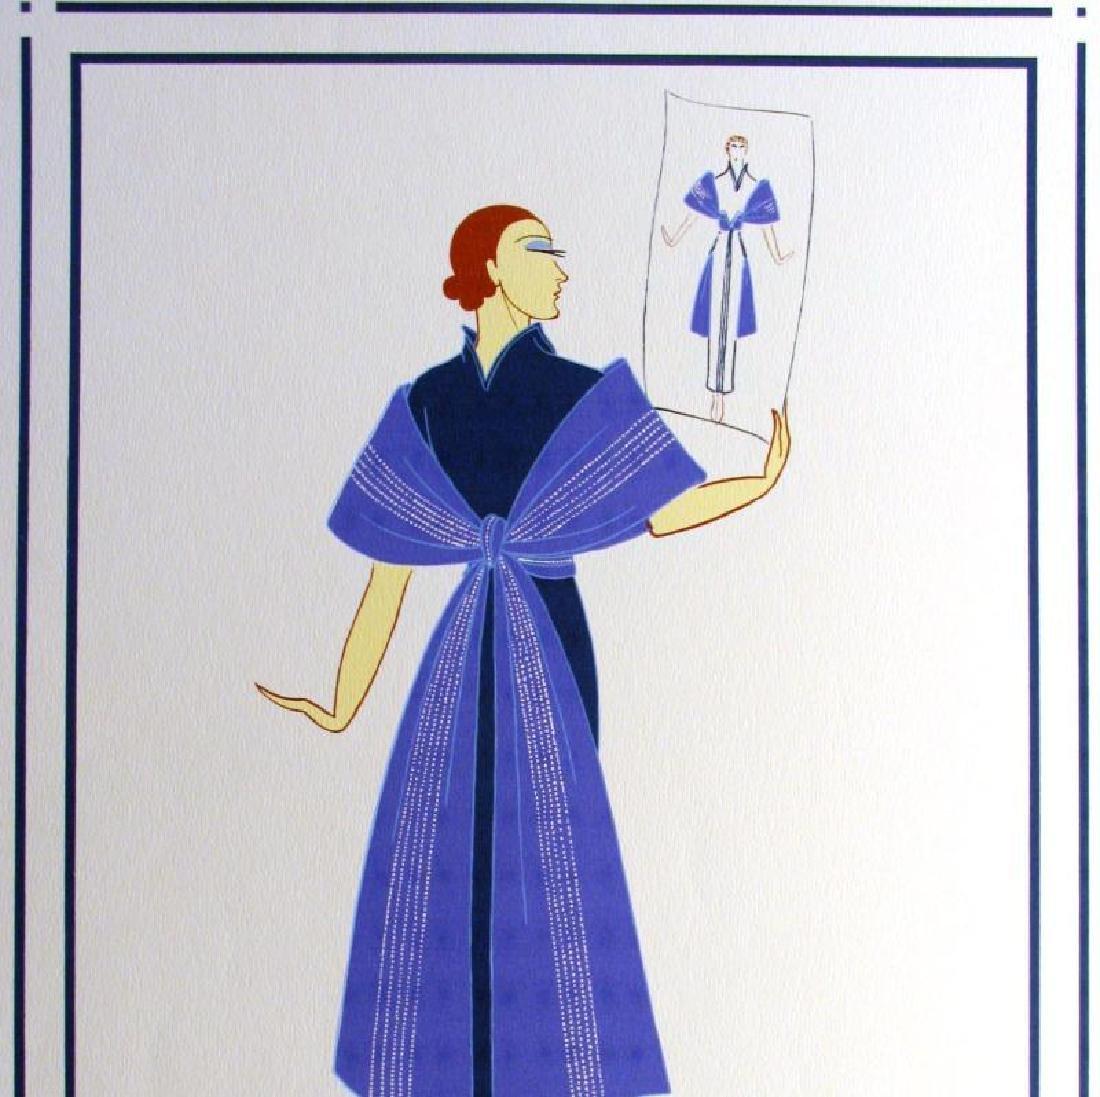 Erte Plate Signed Lithograph Art Deco Fashion Designer - 2